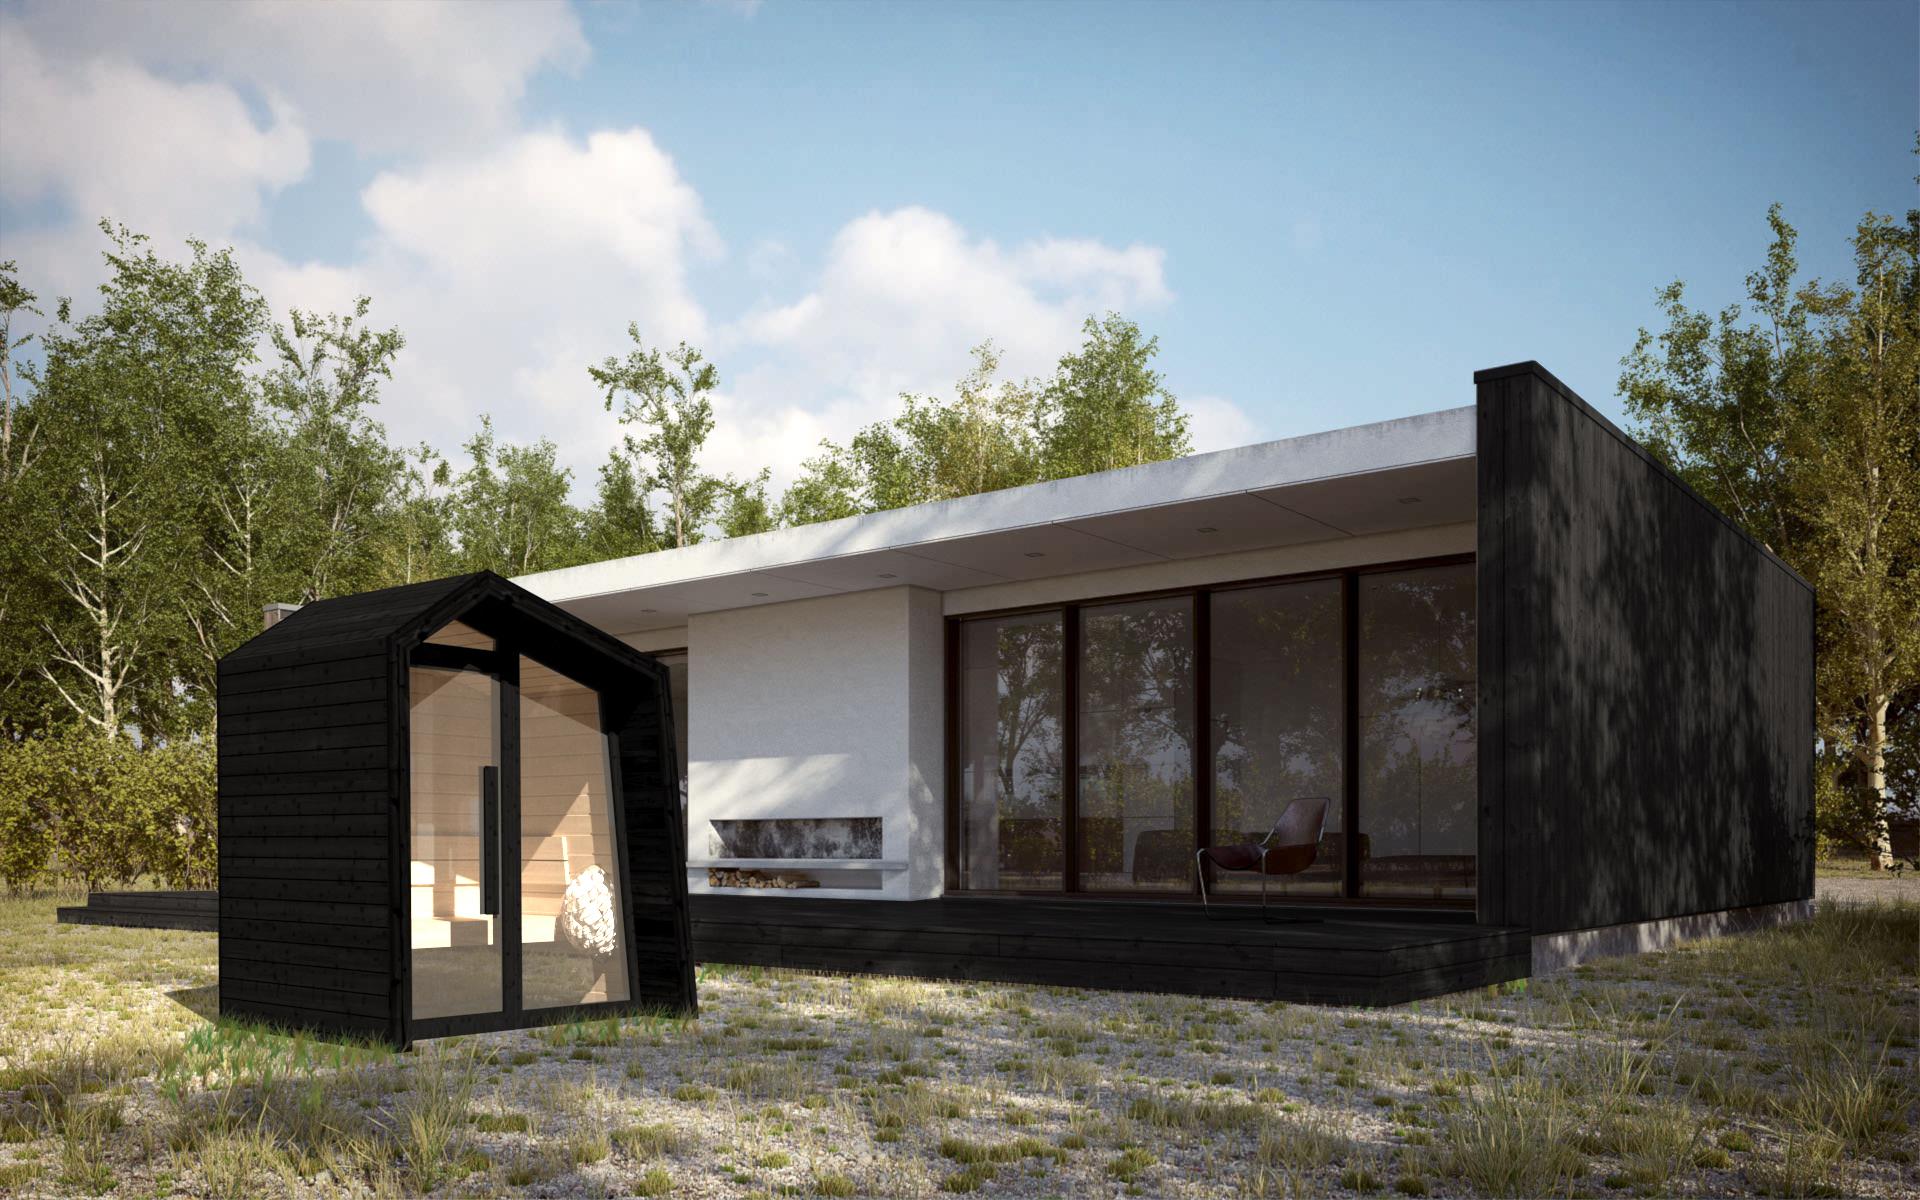 INUA Frigg udend├©rs sauna 3